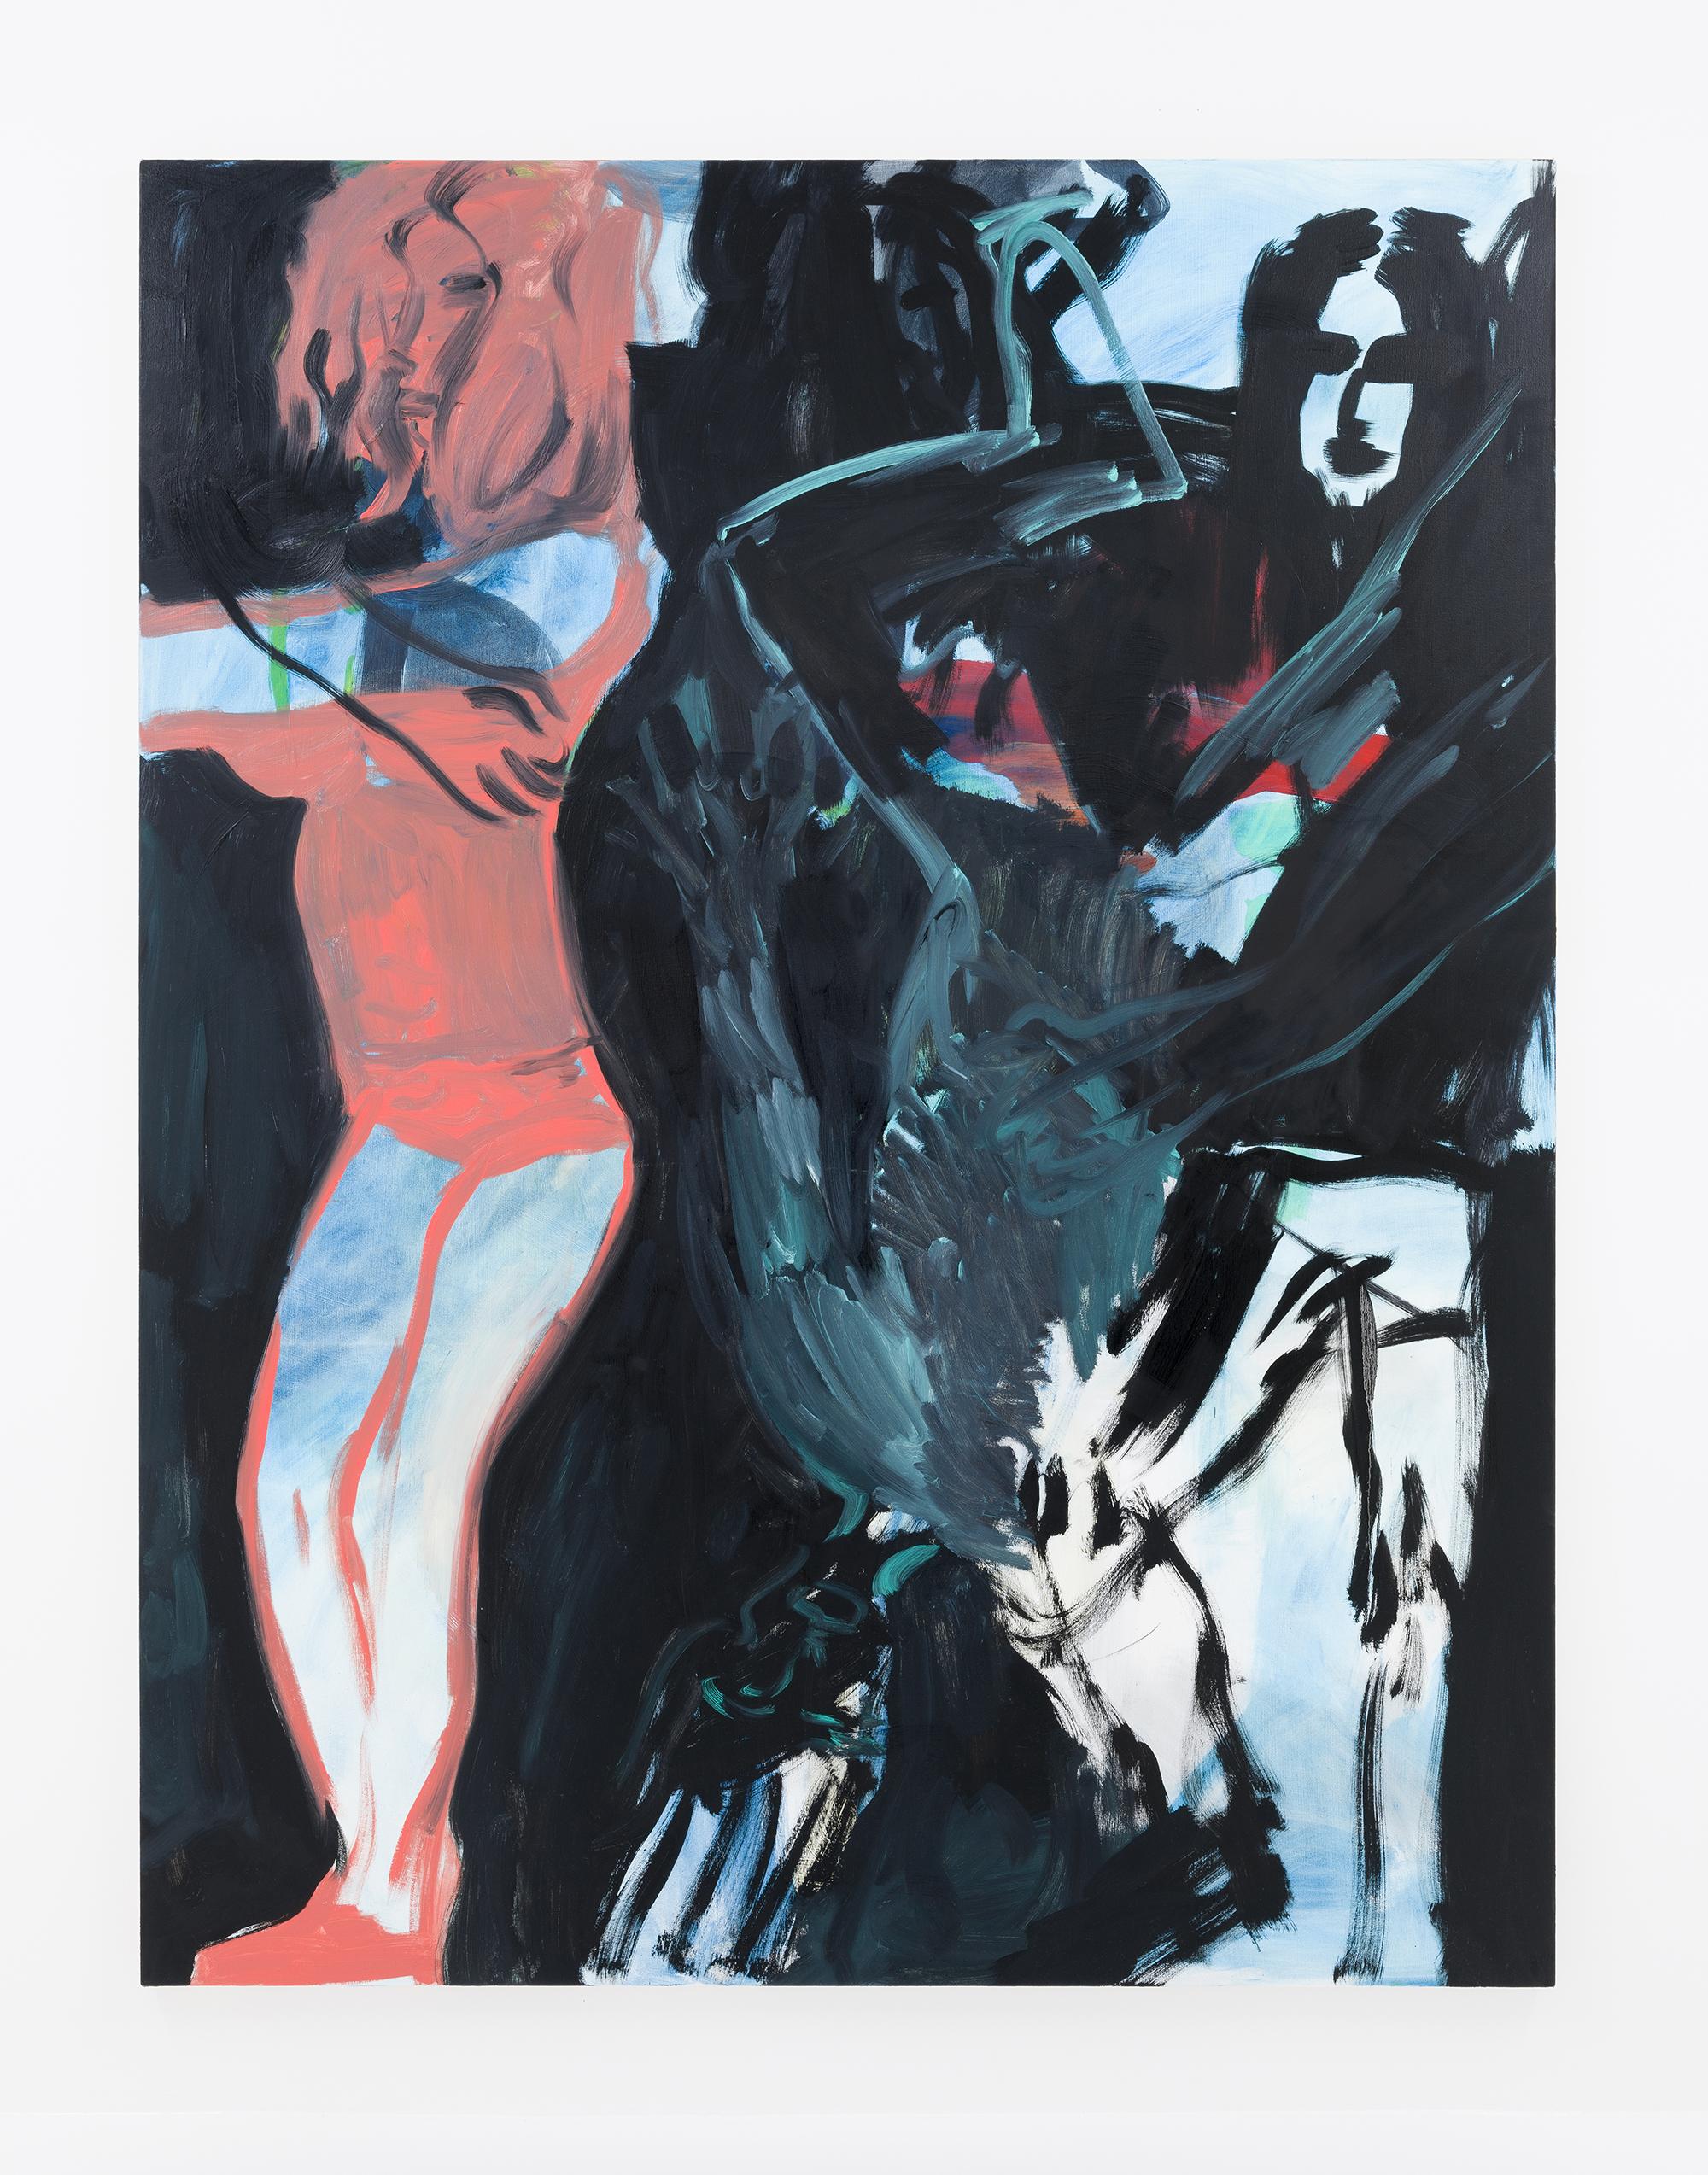 """Club Caligula - Club II"" (2015)  Oil on canvas  90.5 x 71 in"